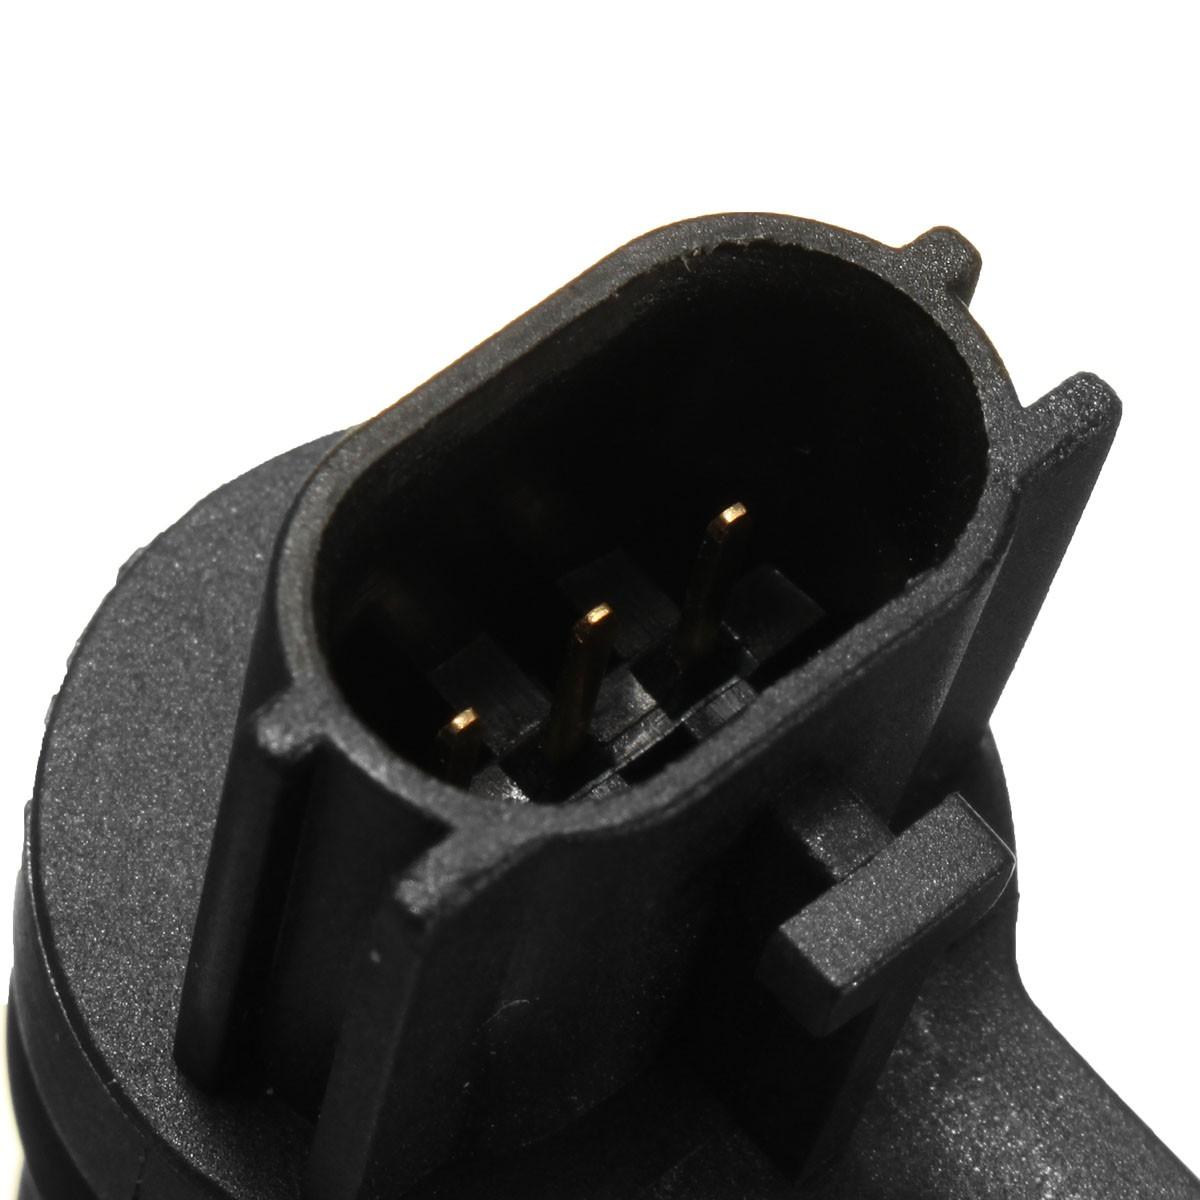 Crank Position Sensor For Nissan FX35 350Z Murano Quest